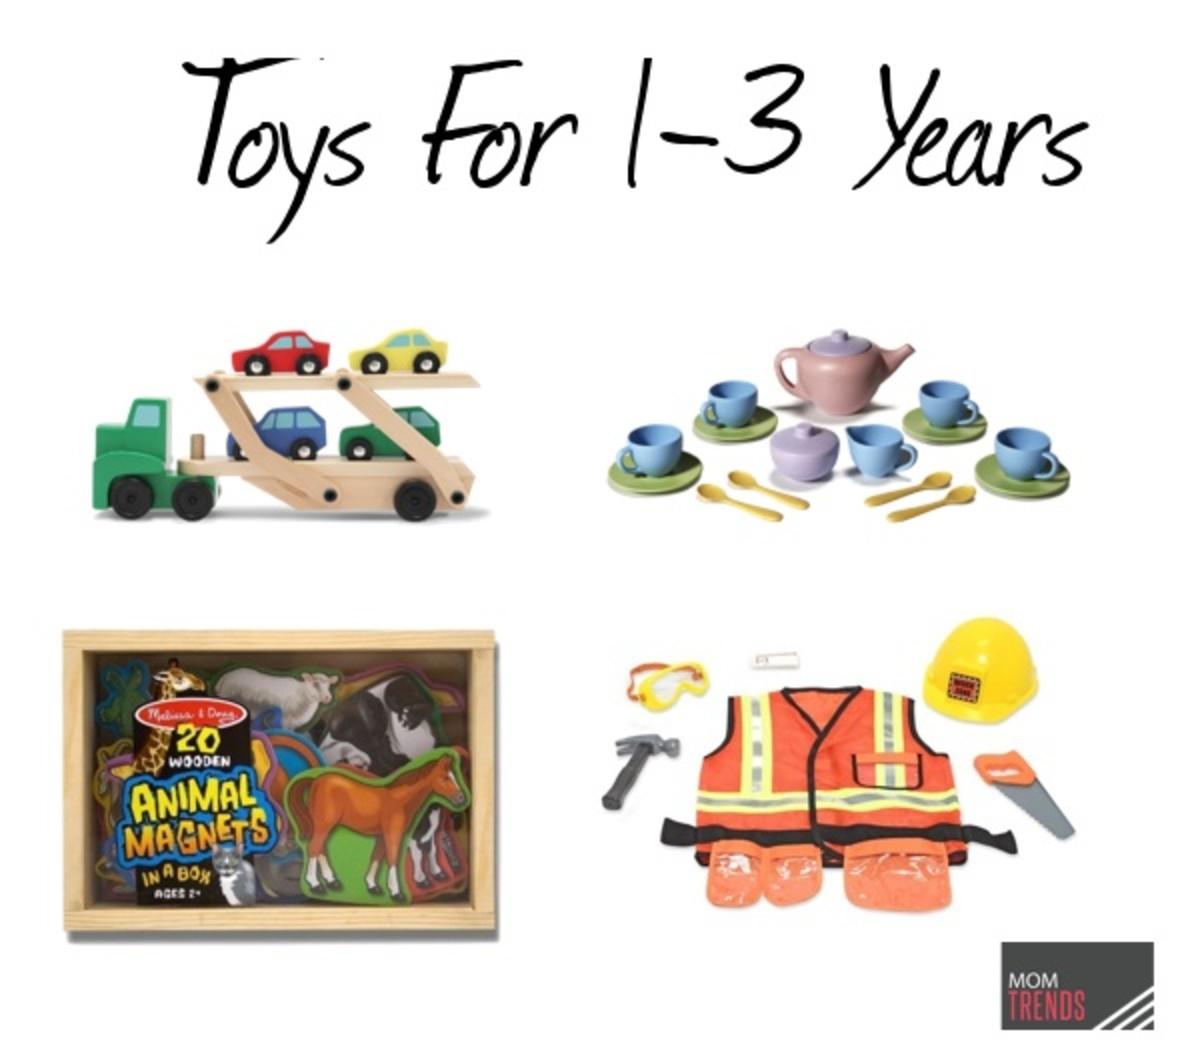 Toys for 1-3yo